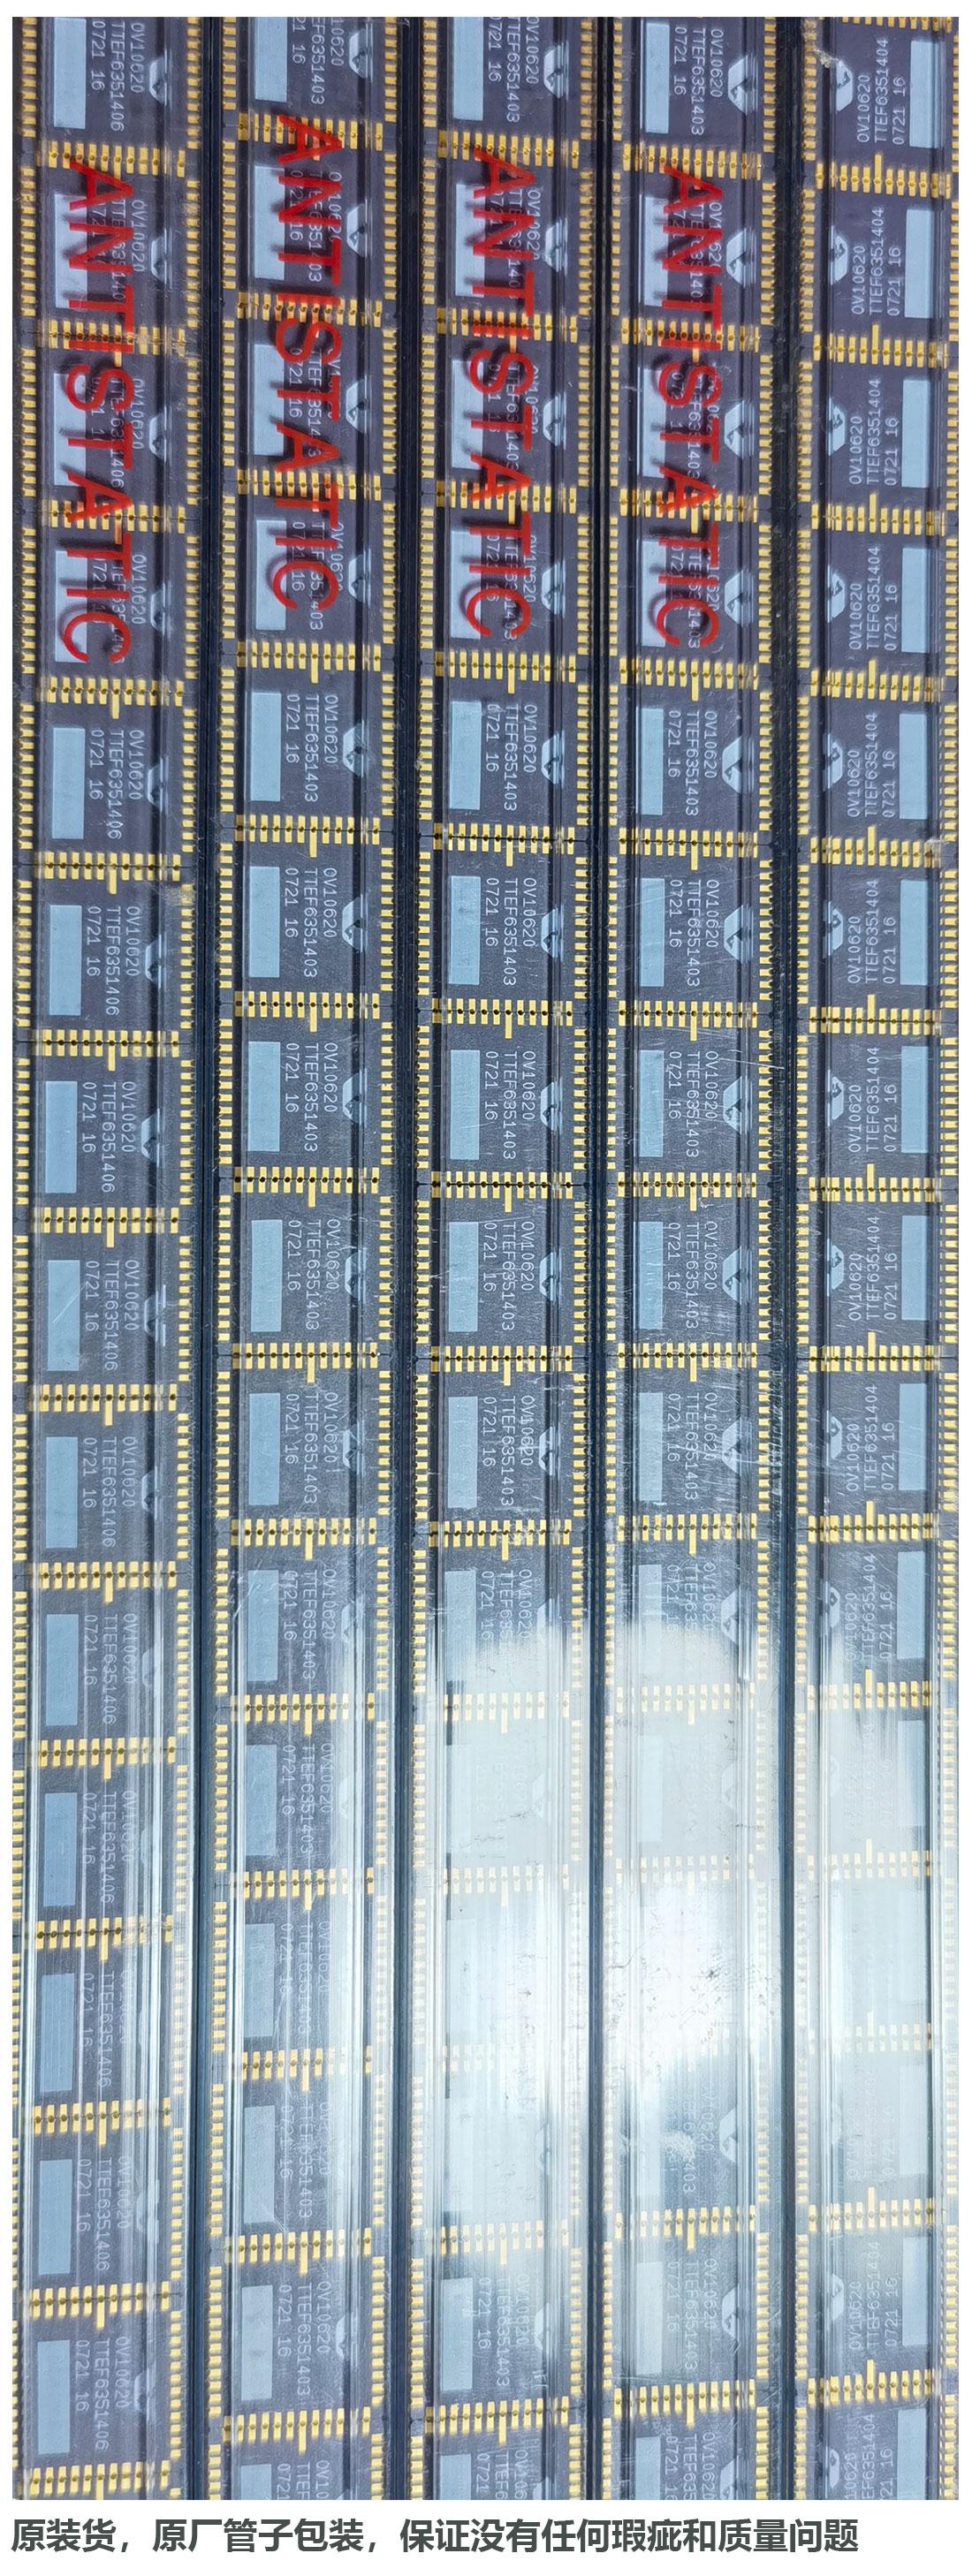 OV10620, 1000nm近红外光谱光敏度,彩色高动态范围(HDR), CMOS Camera Chip,汽车后视和安防监控摄像机图像传感器,768 x 492 (WVGA)图像阵列,6x6μm微米像素CMOS SENSOR,大像素点cmos sensor